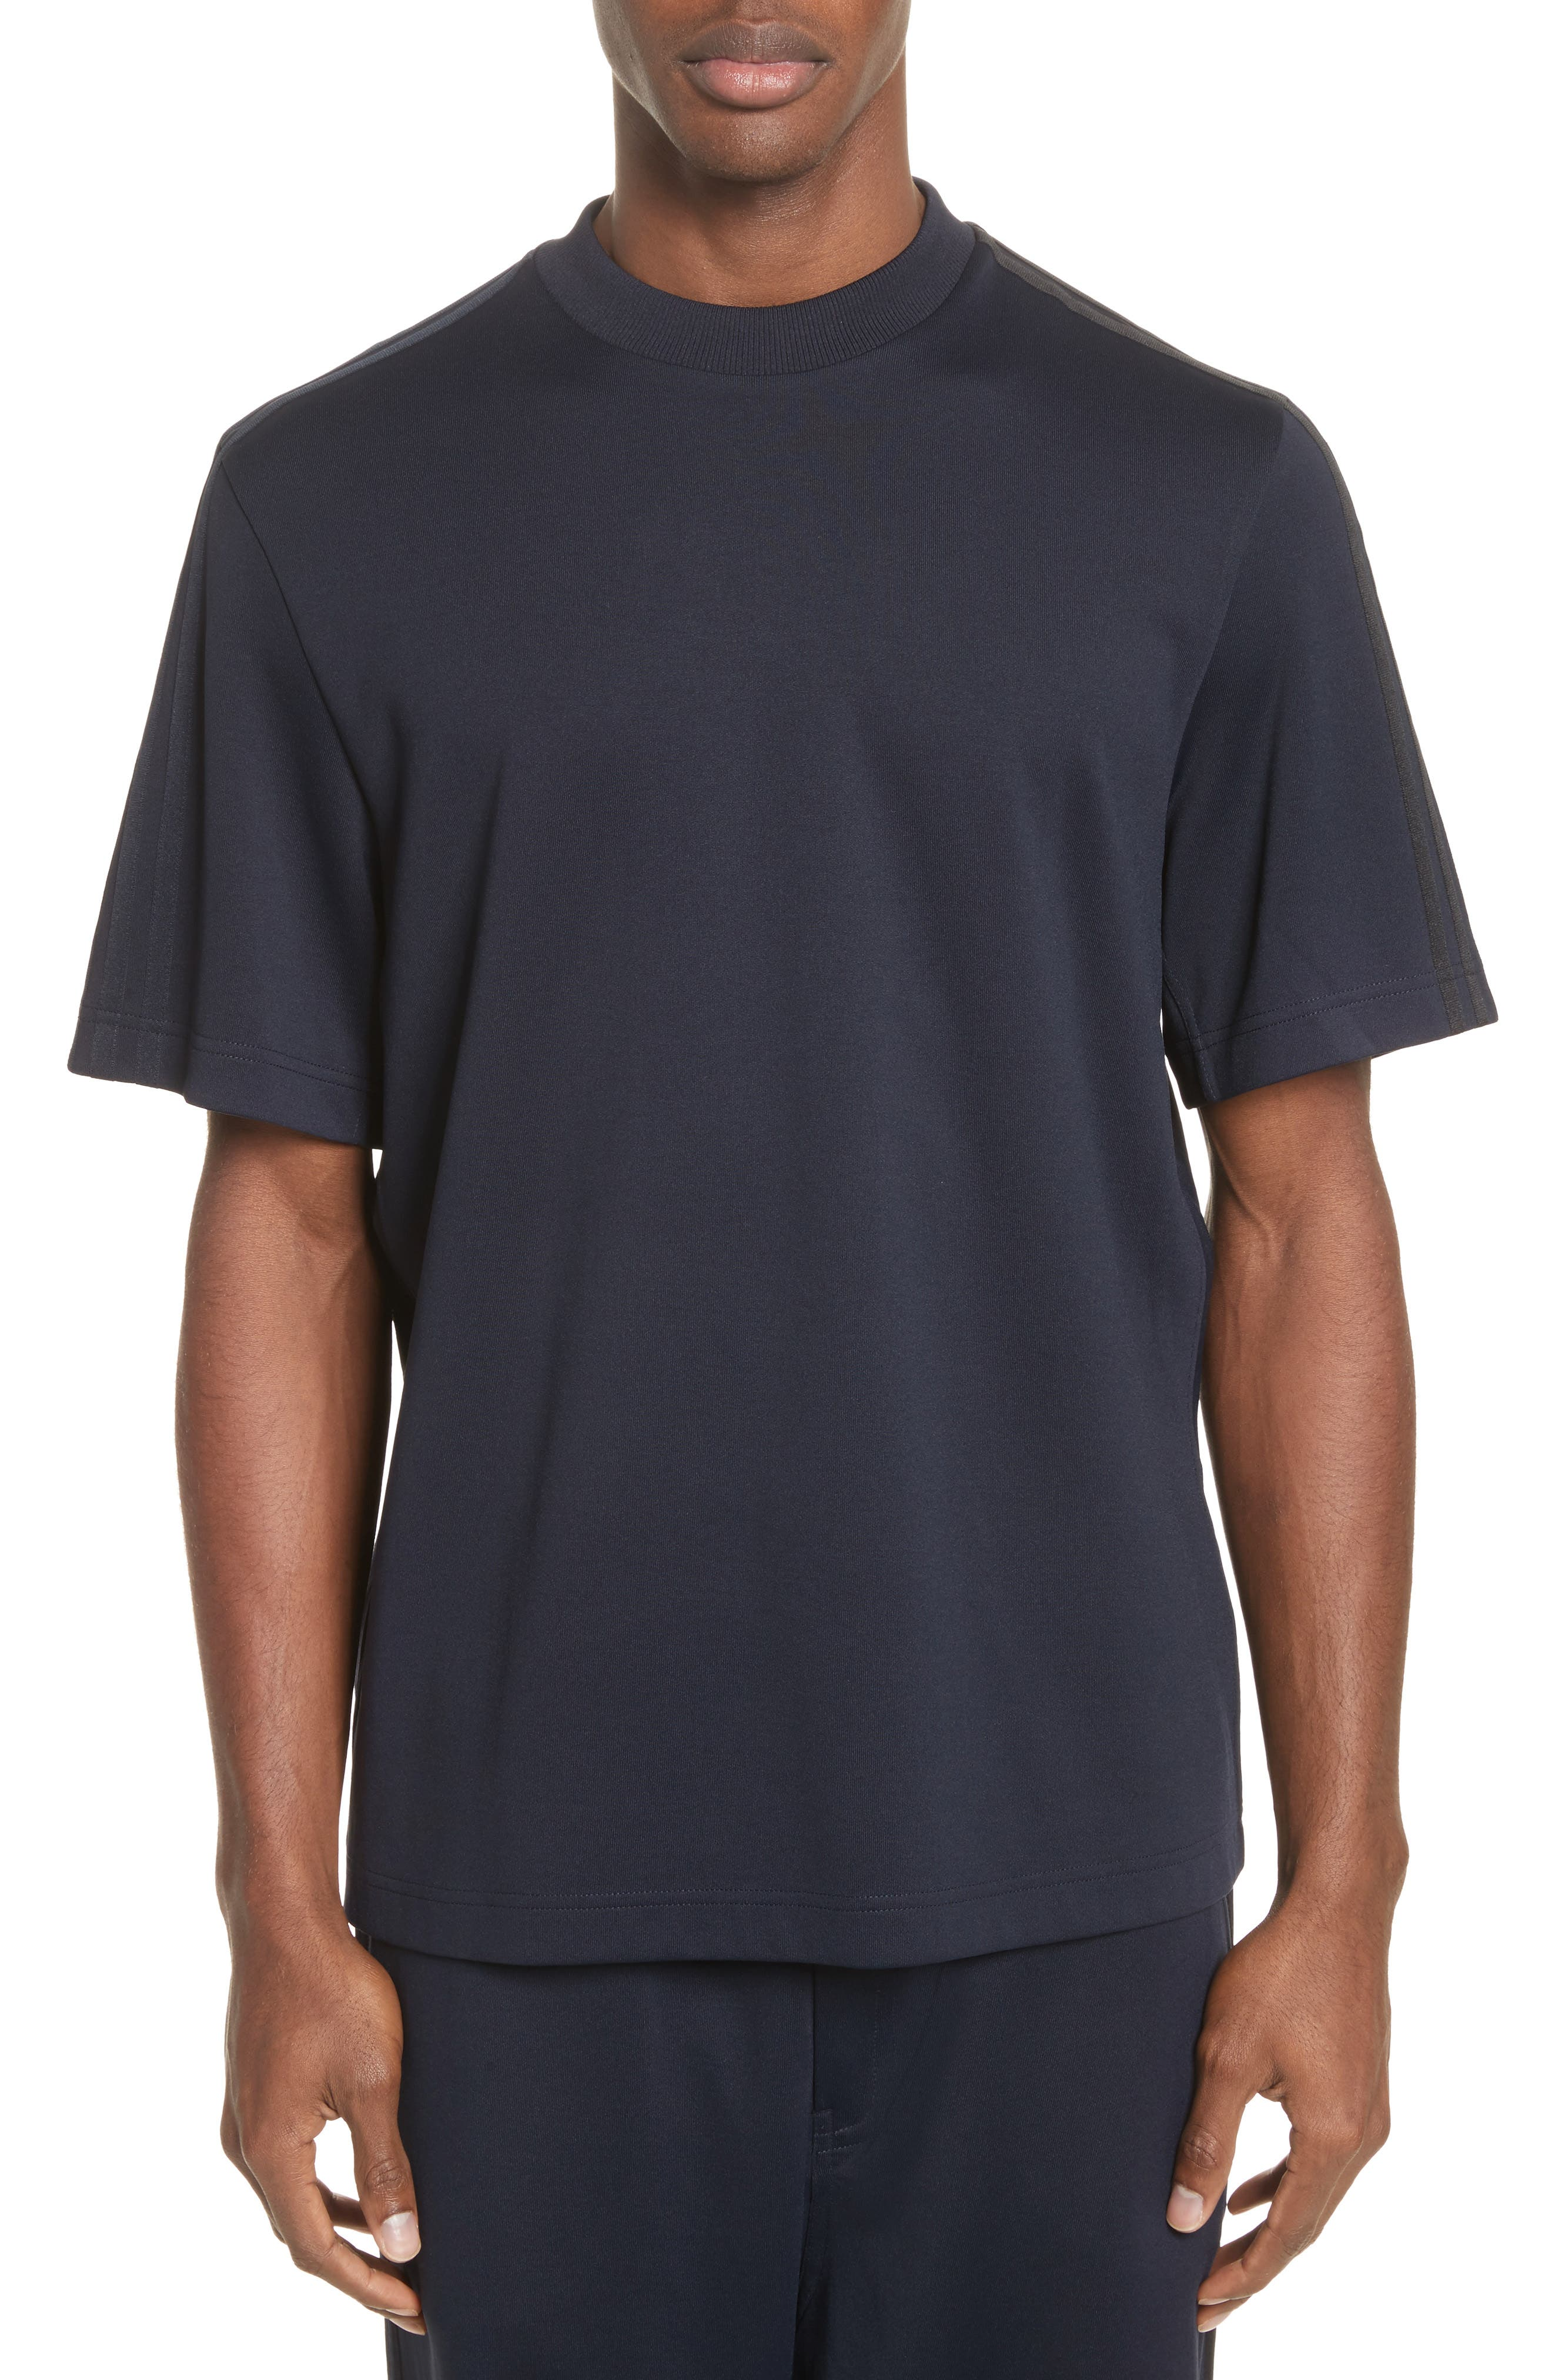 Y-3 x adidas Tonal Stripe Crewneck T-Shirt